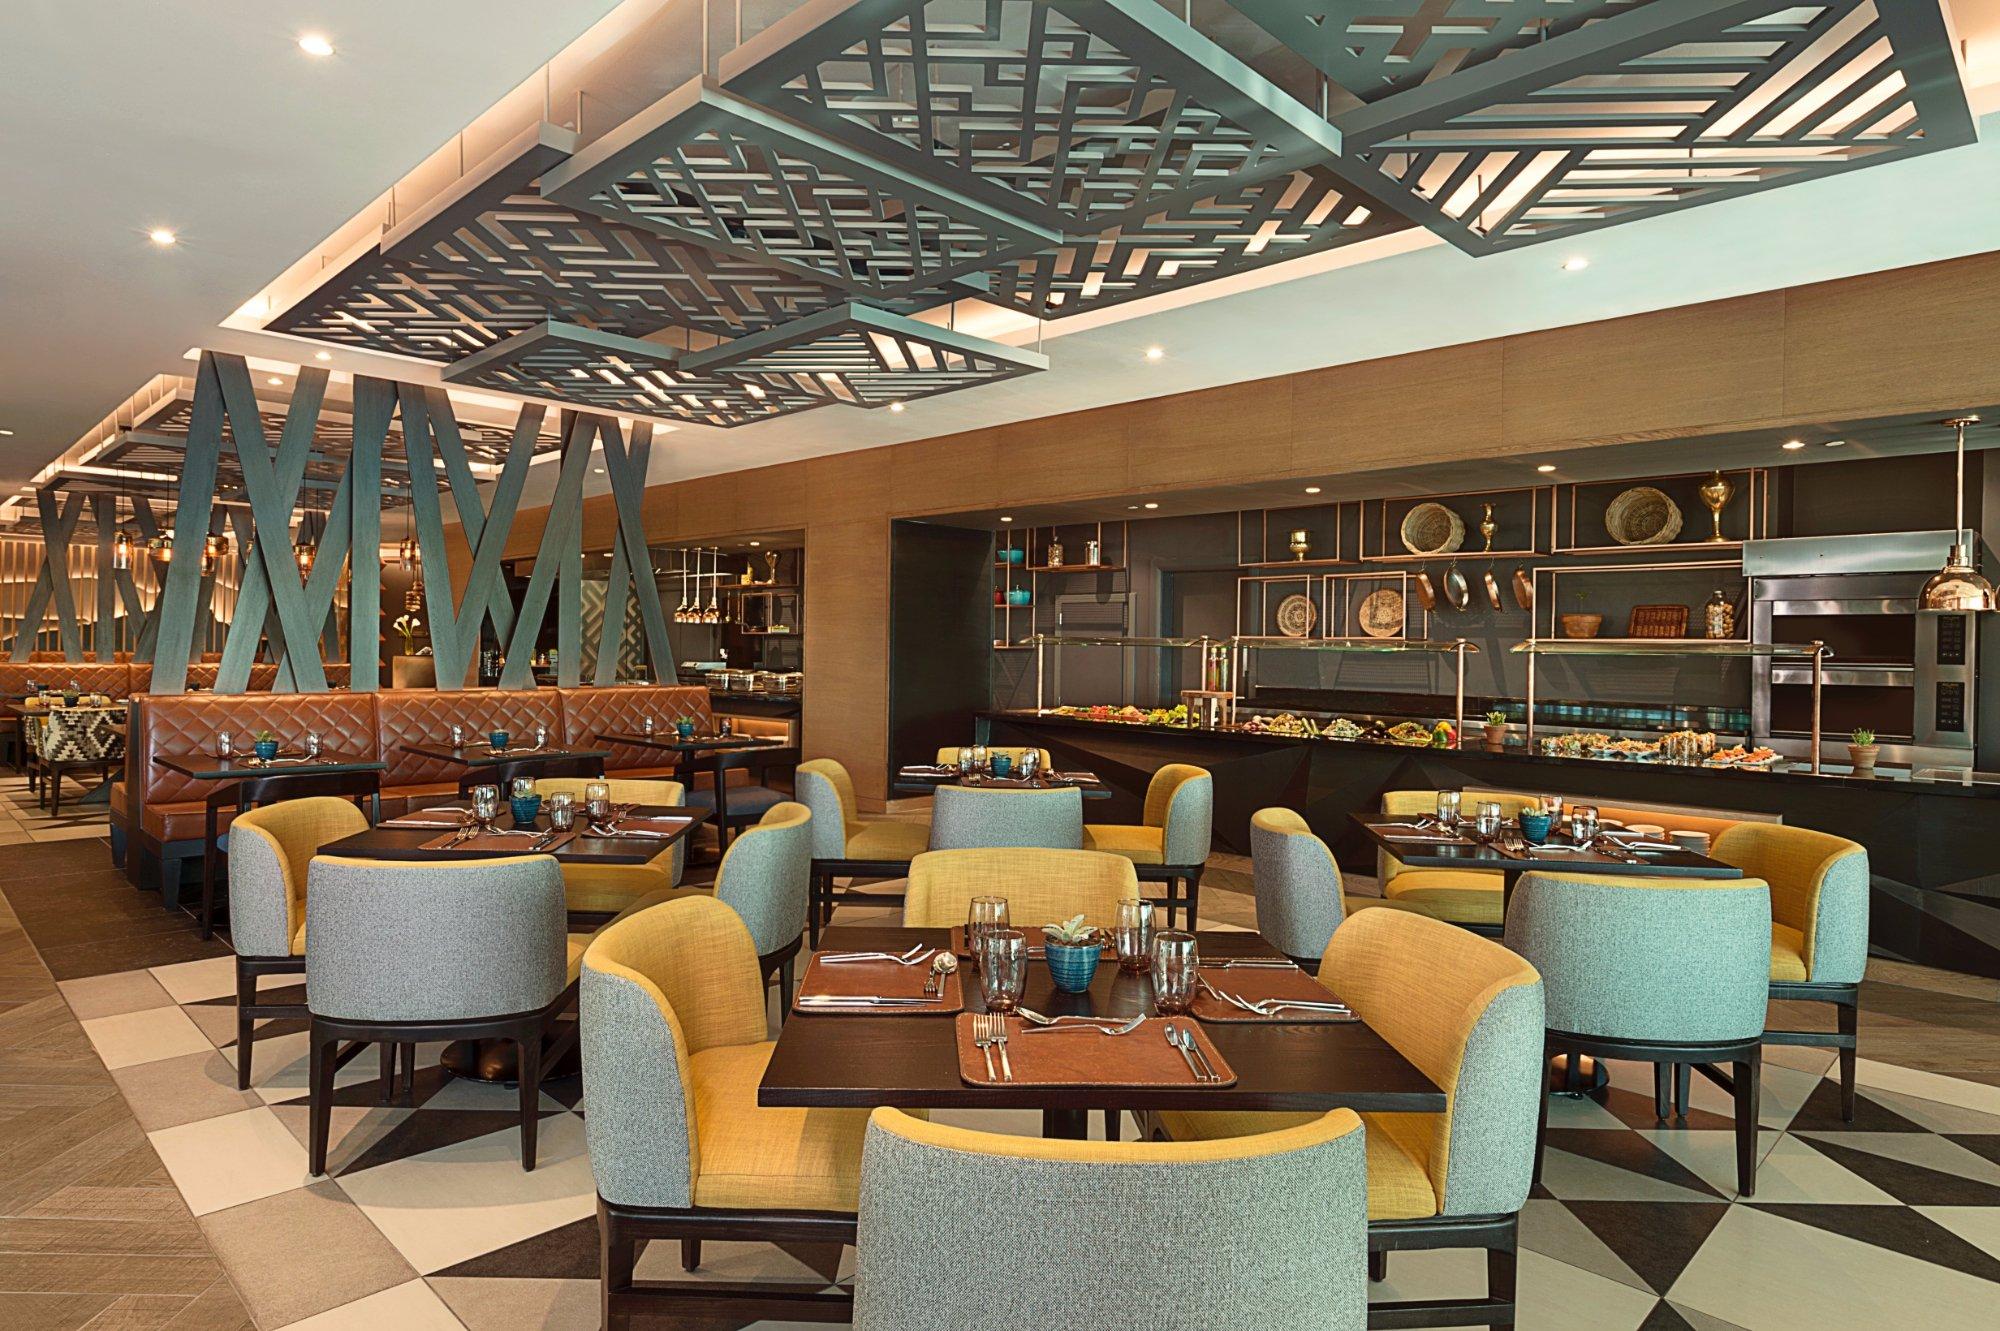 Durban casino restaurants